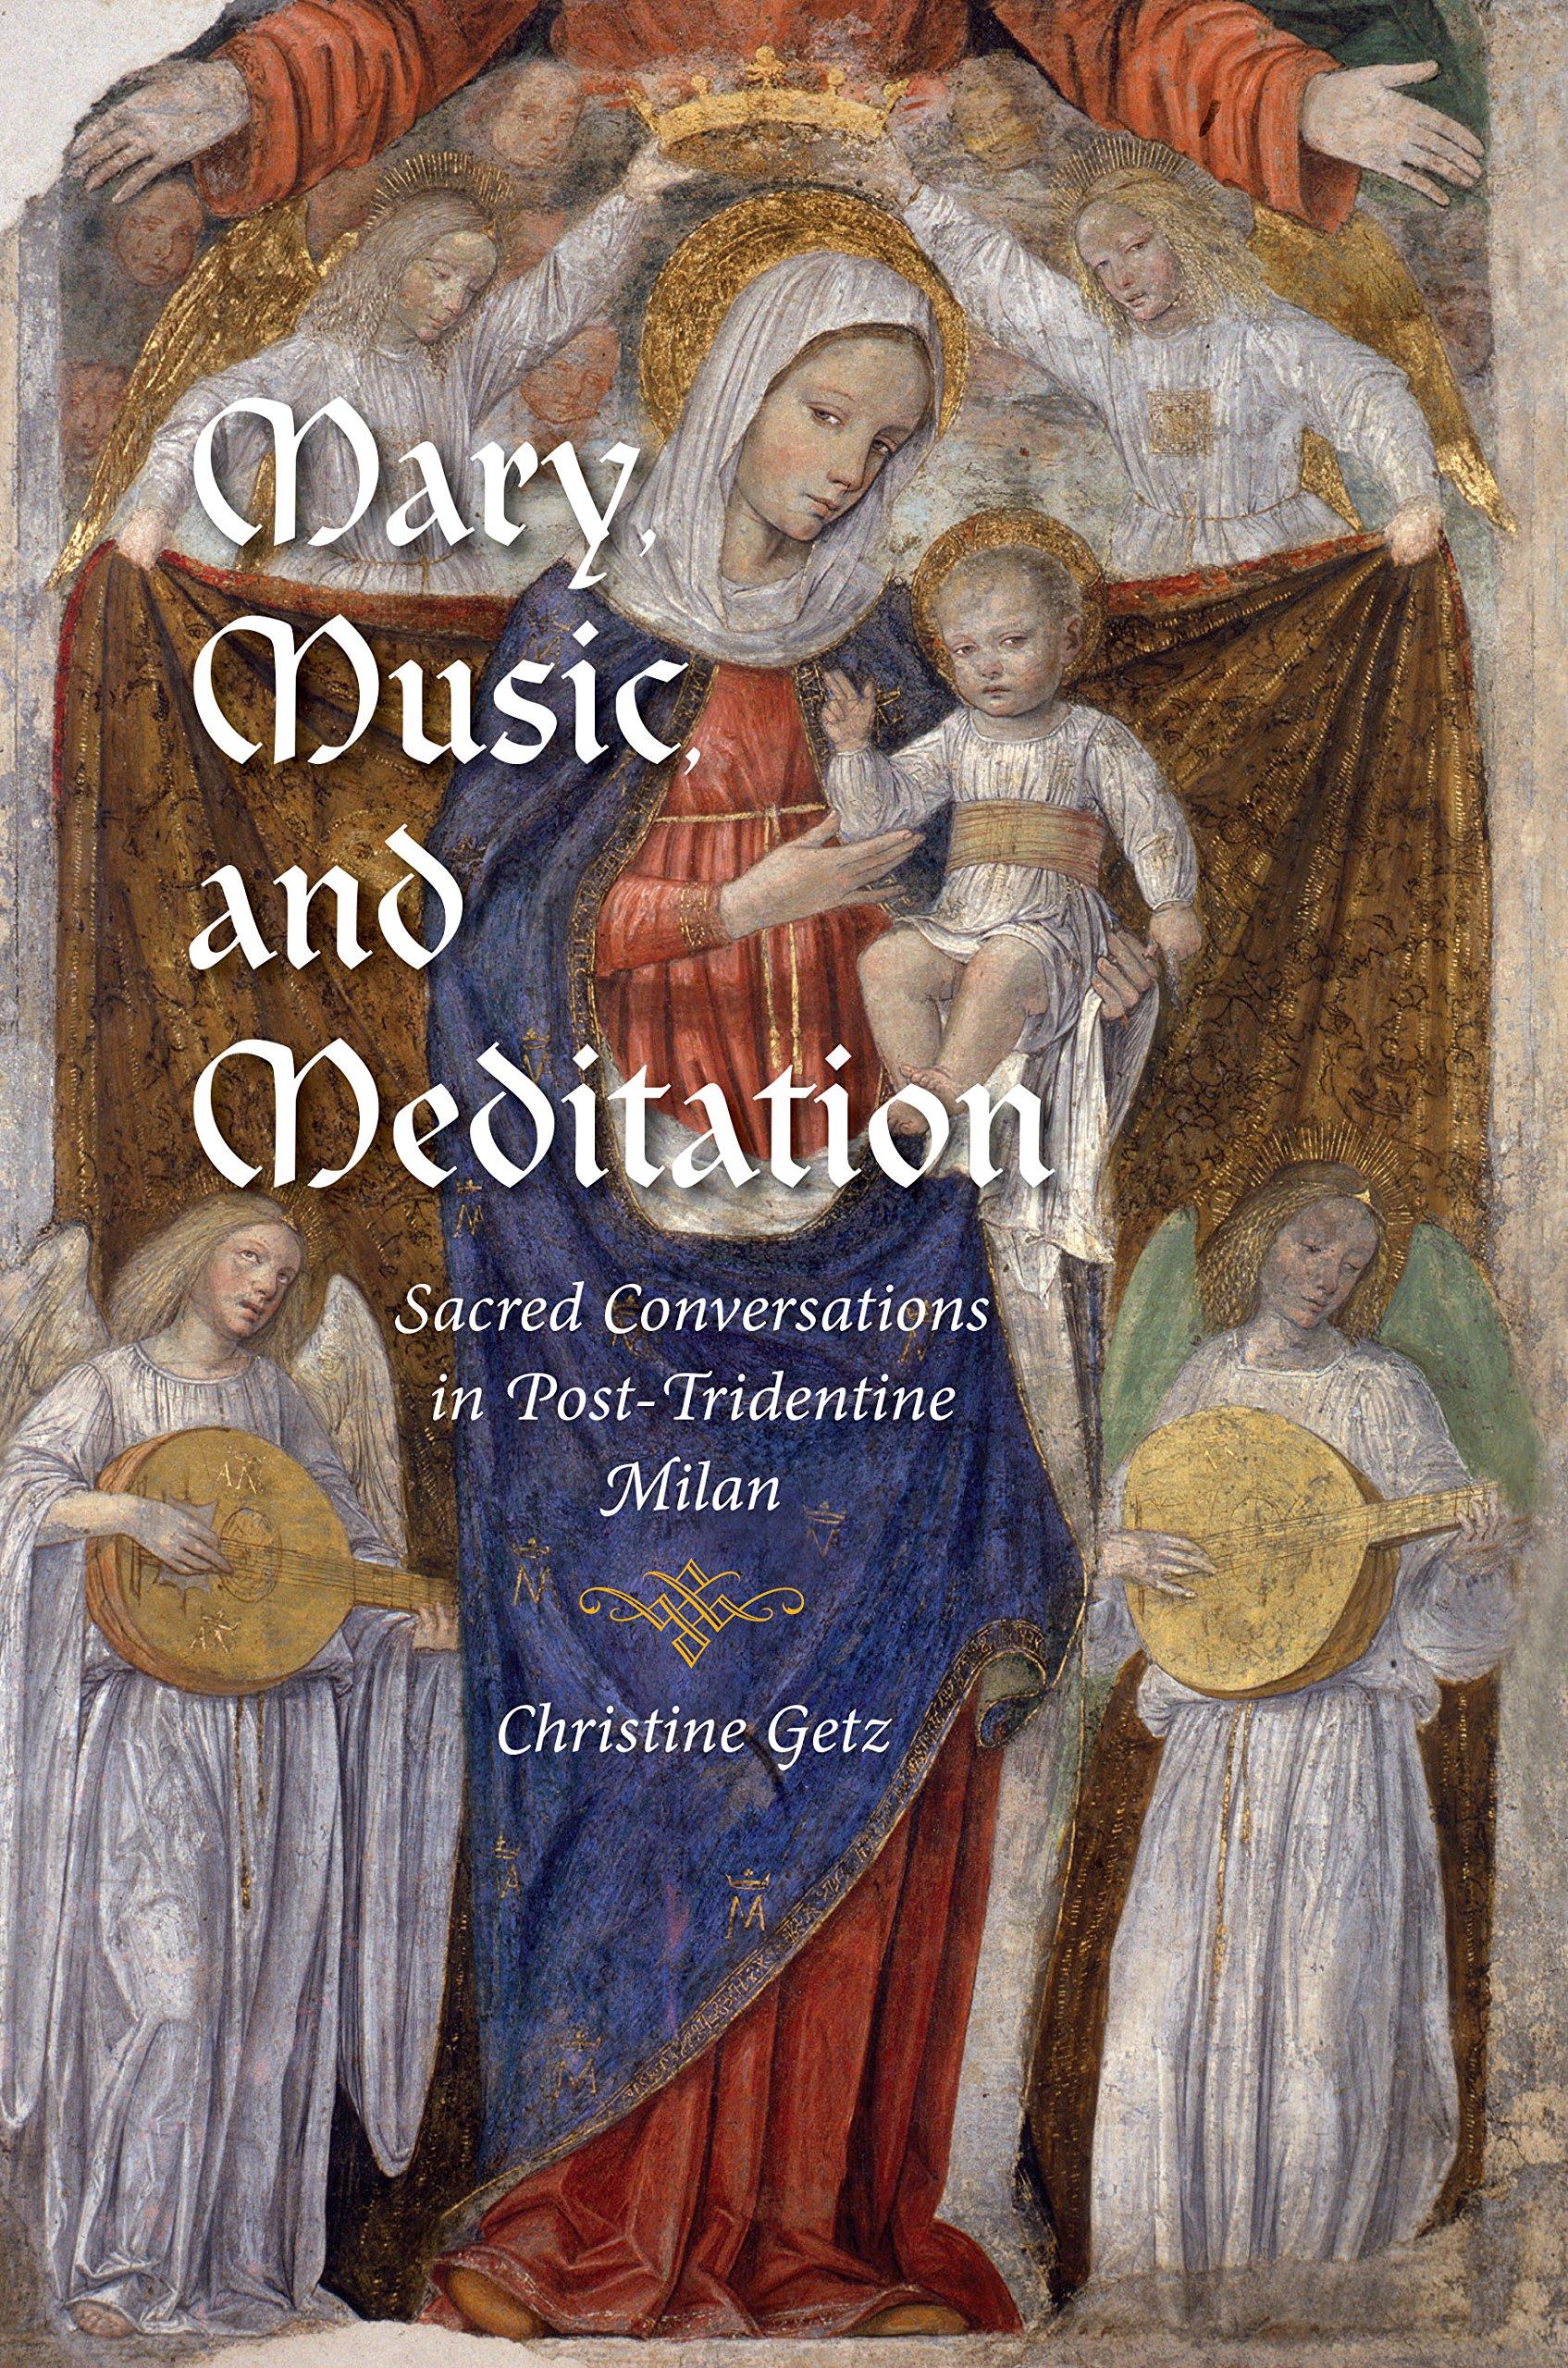 Mary, Music, and Meditation: Sacred Conversations in Post-Tridentine Milan (Inglese) Copertina rigida – 8 lug 2013 Christine Getz Indiana Univ Pr 0253007879 16th century